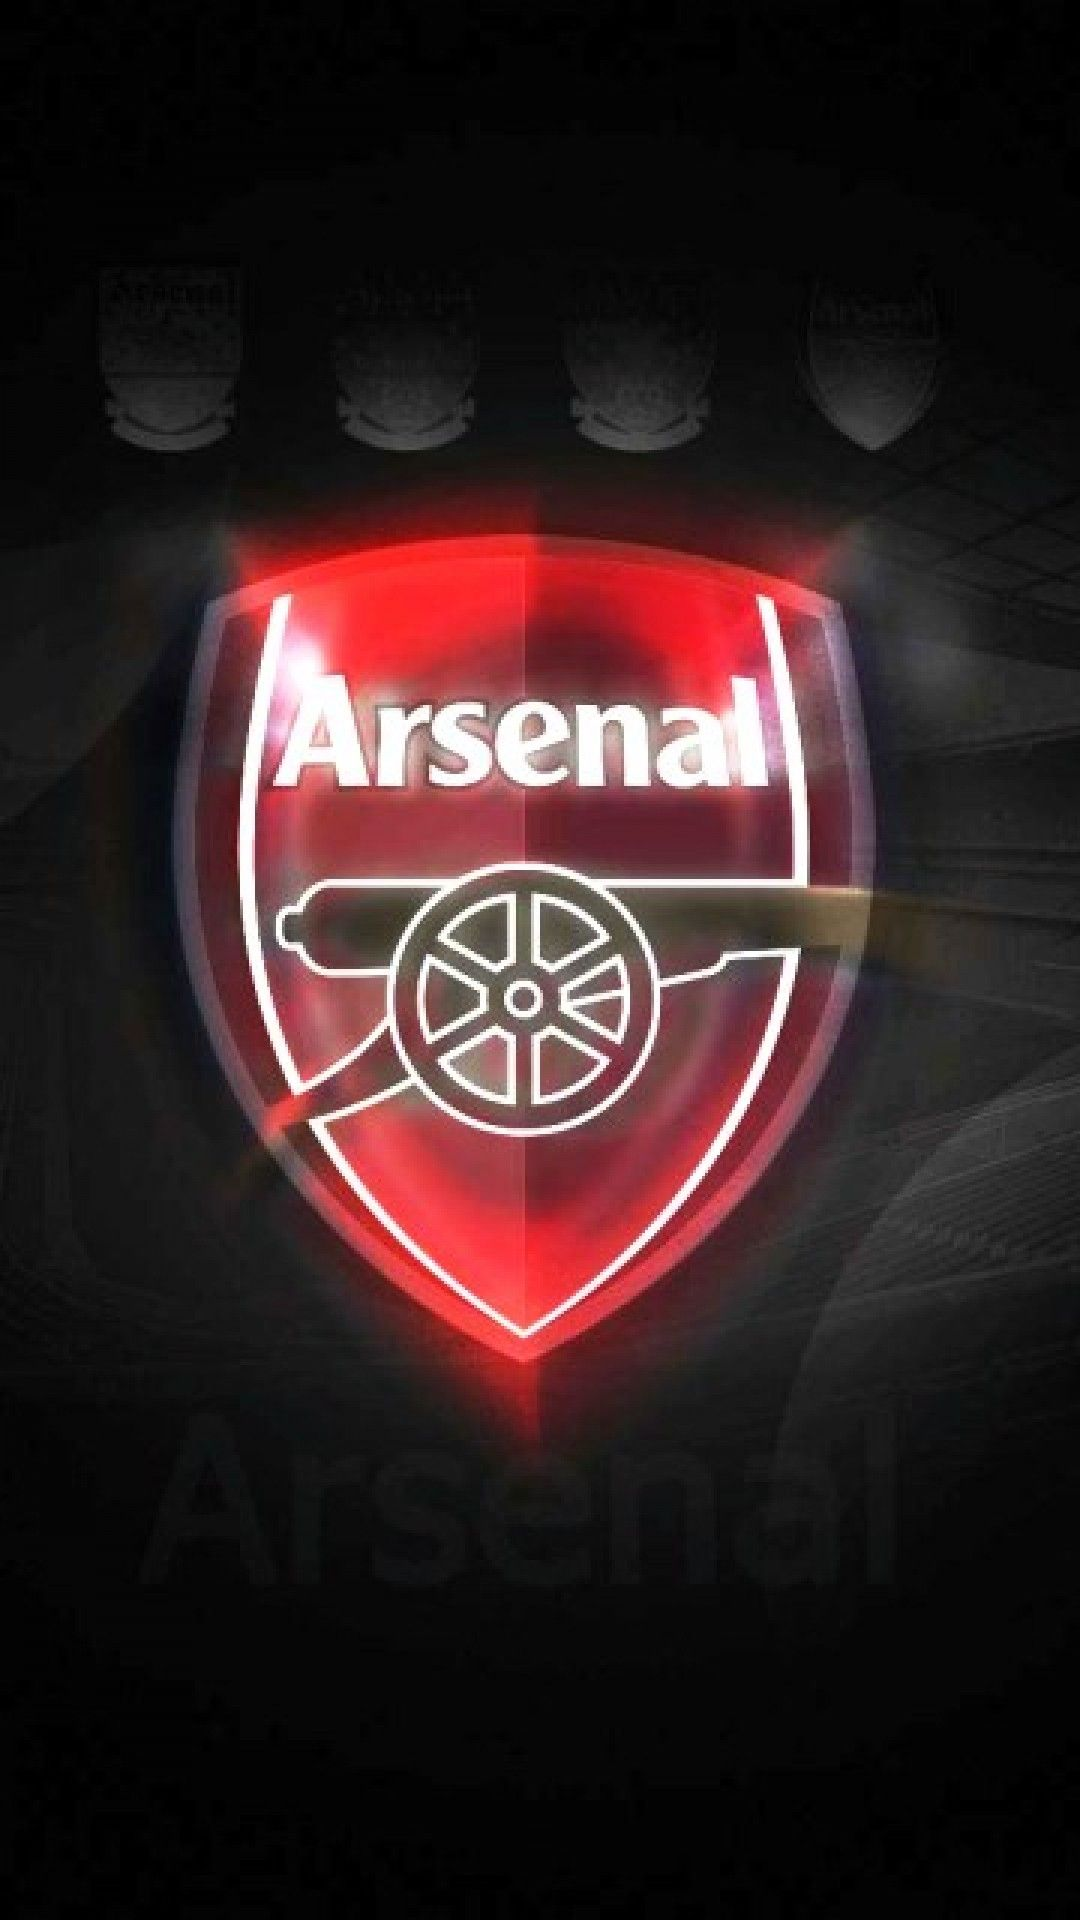 Wallpaper iphone arsenal - Arsenal Football Club Wallpaper Football Wallpaper Hd Wallpapers For Desktop Pinterest Arsenal And Wallpaper